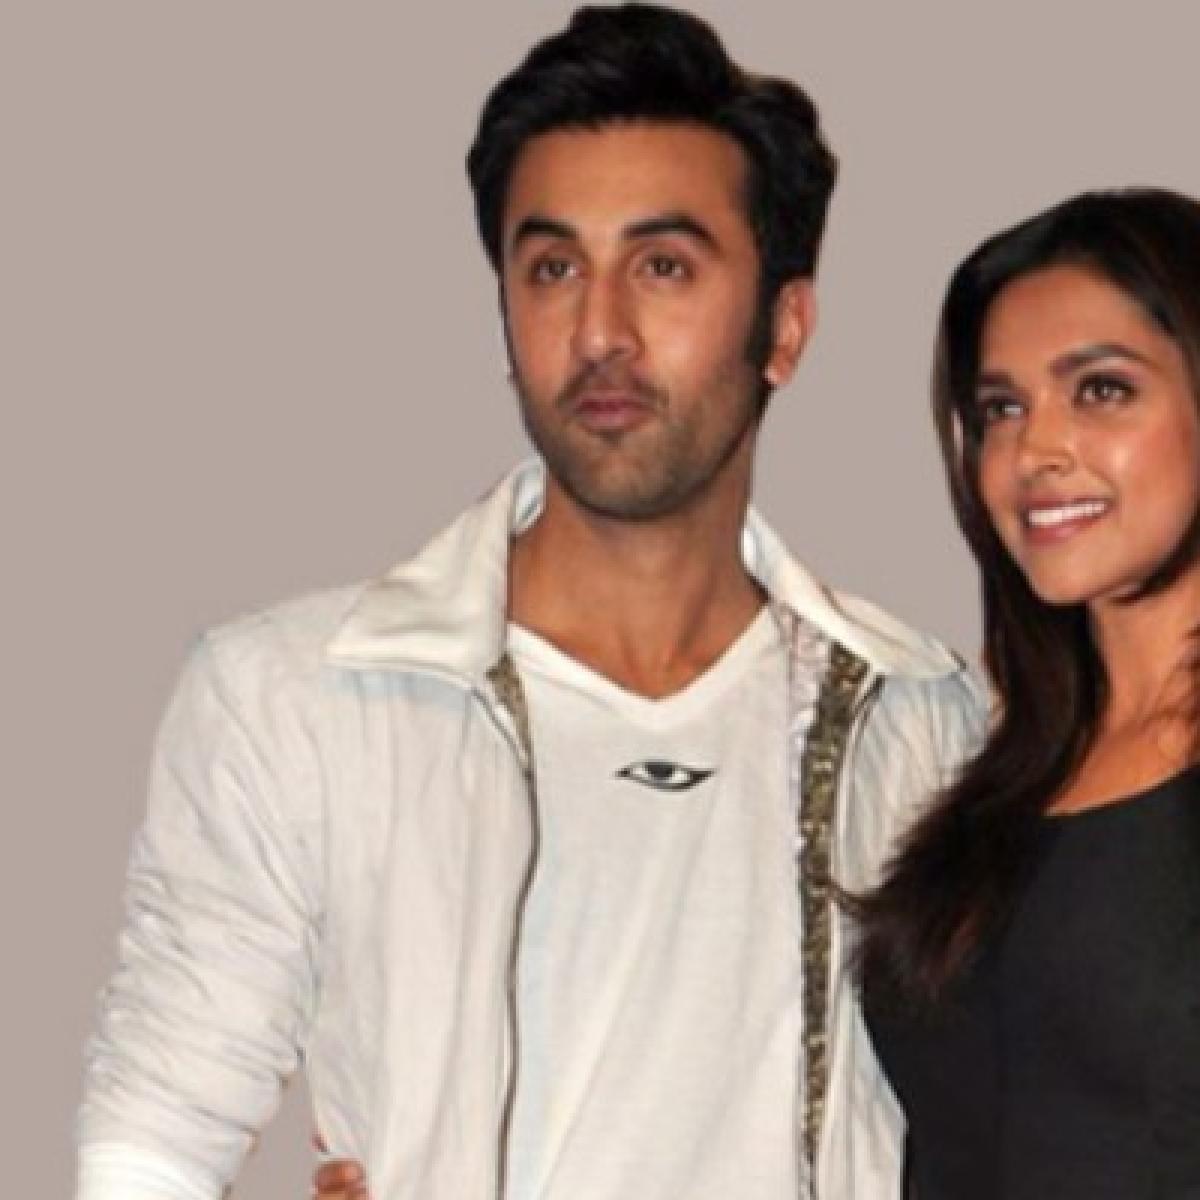 Deepika Padukone, Ranbir Kapoor to reunite for Luv Ranjan's next